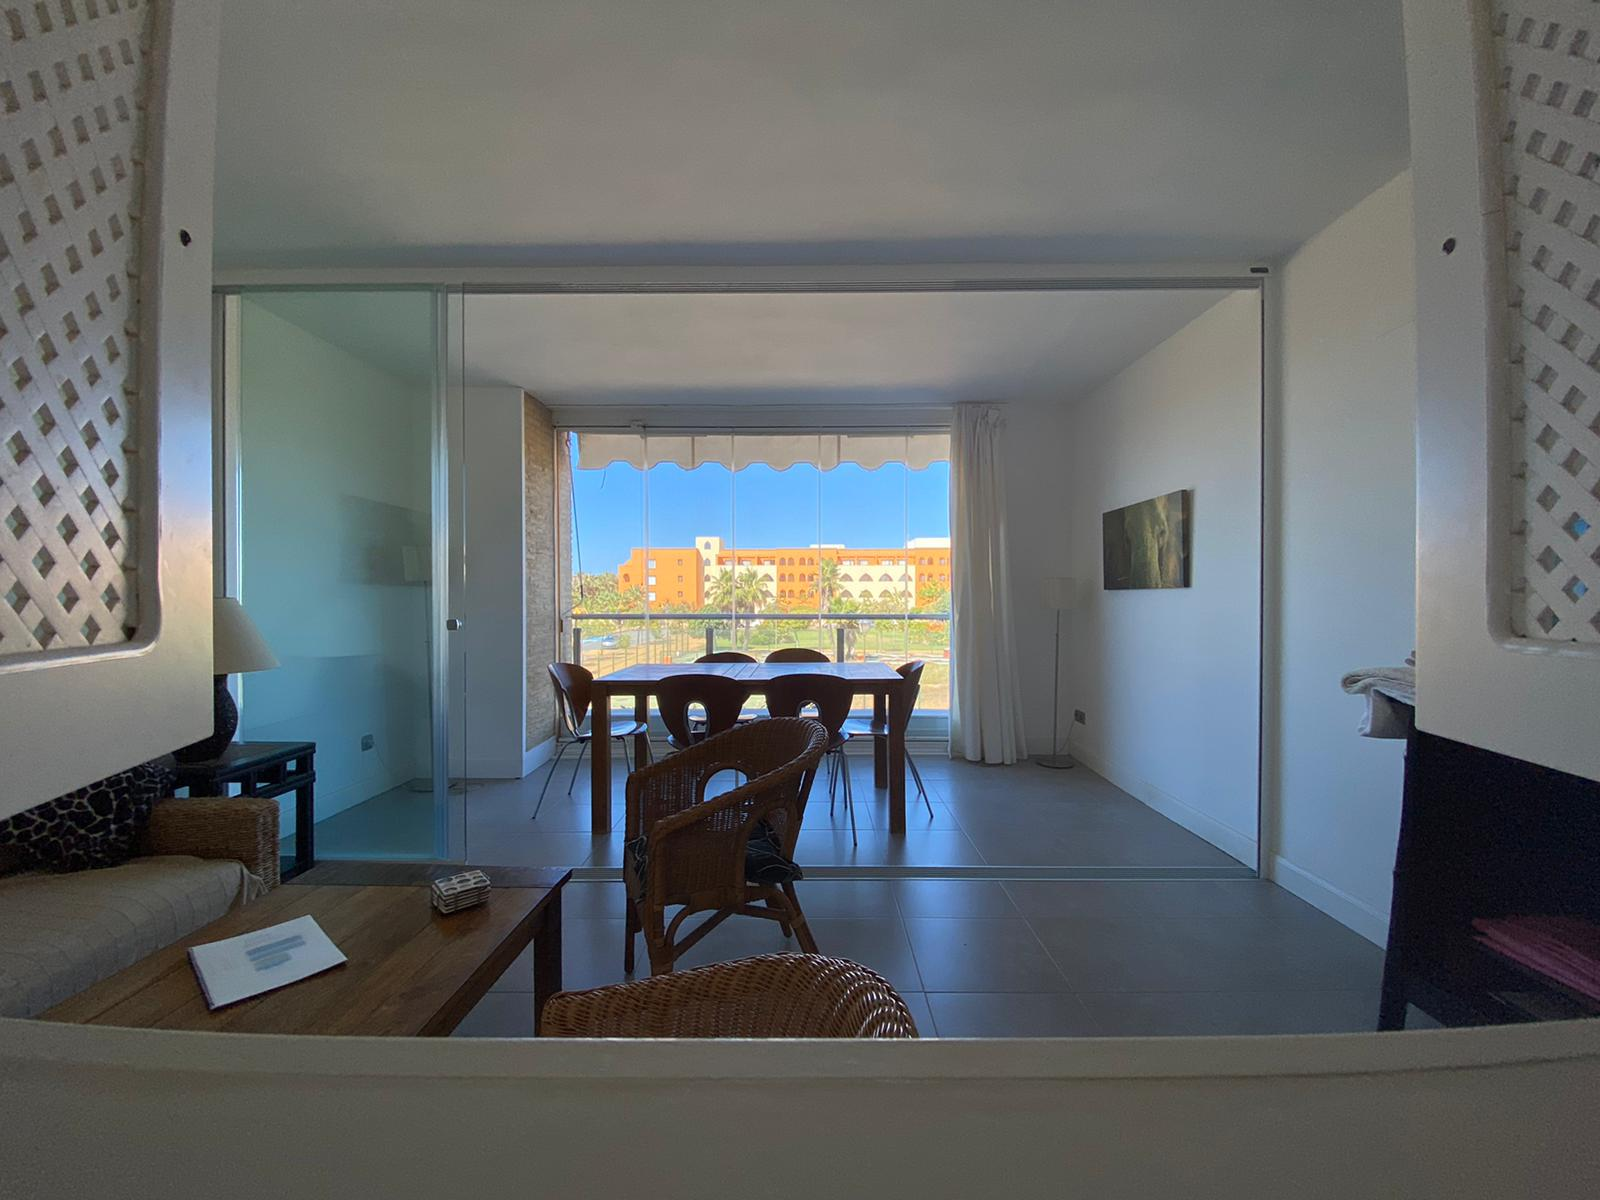 Imagen 9 del Apartamento en El Espigón, 1ª Planta nº4 Poniente (3d+2b), Punta del Moral (HUELVA), Paseo de la Cruz nº22